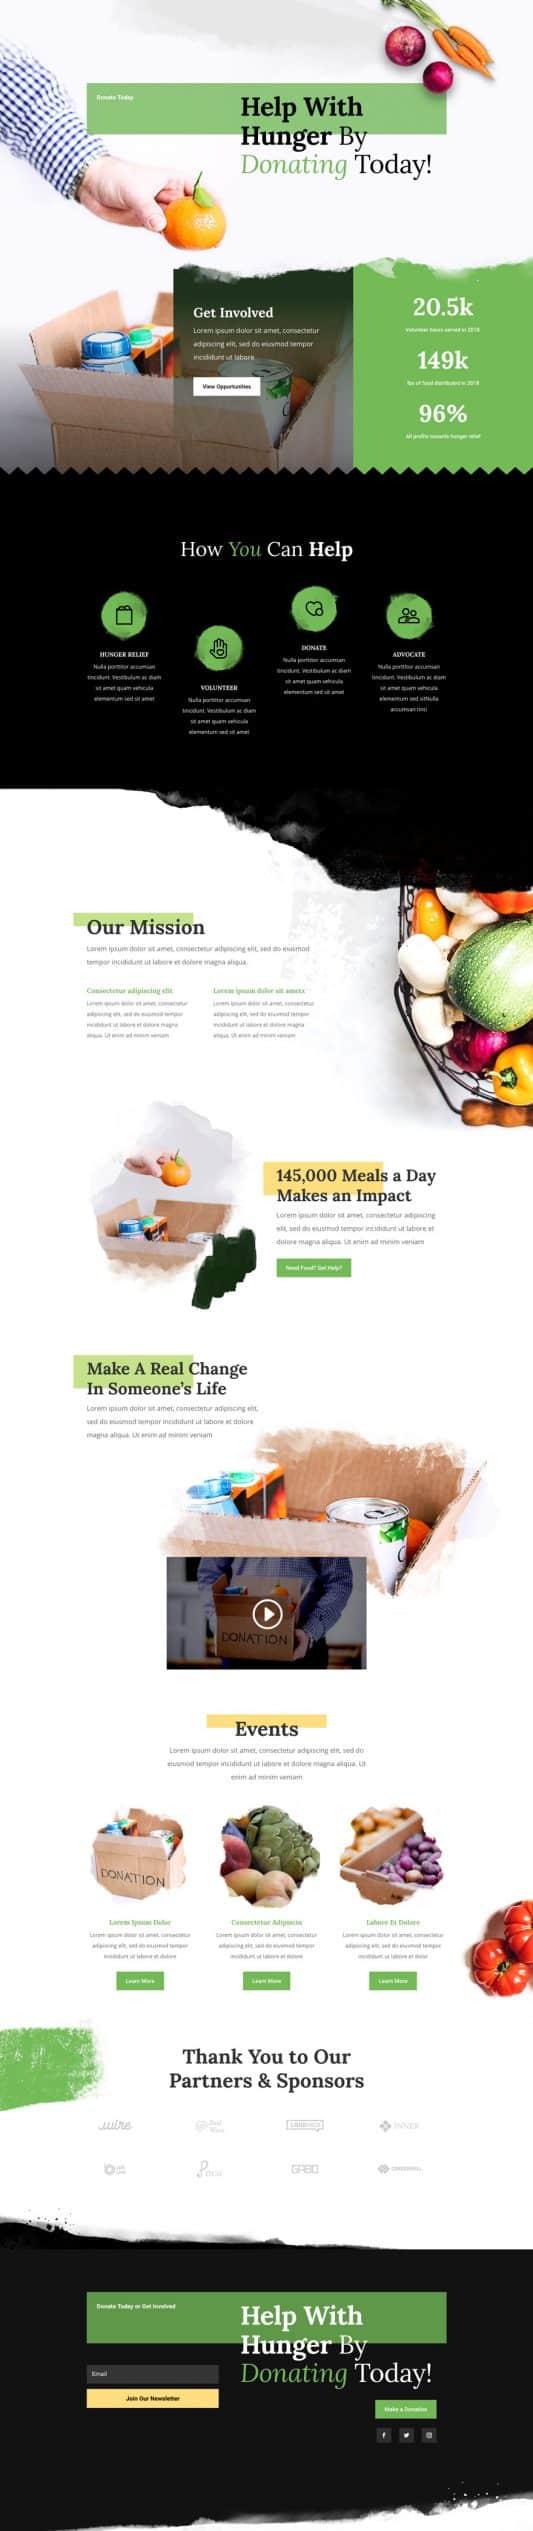 Food Bank Web Design 8